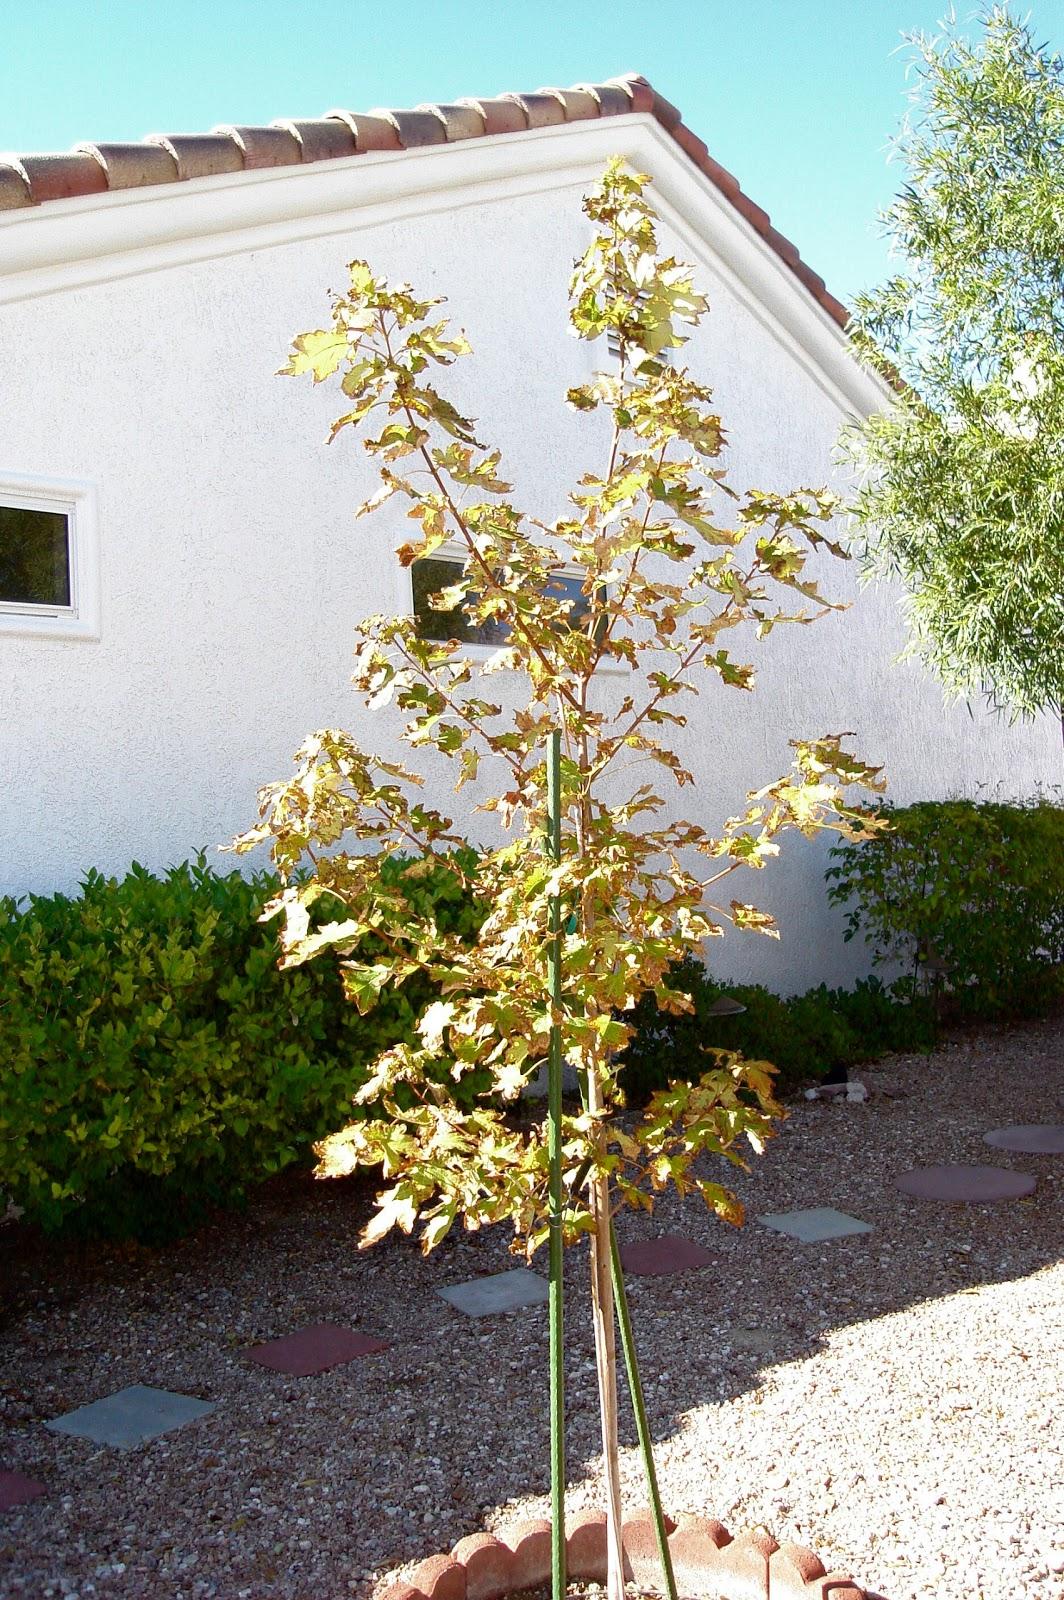 Autumn Blaze Maple Not A Good Choice For Las Vegas